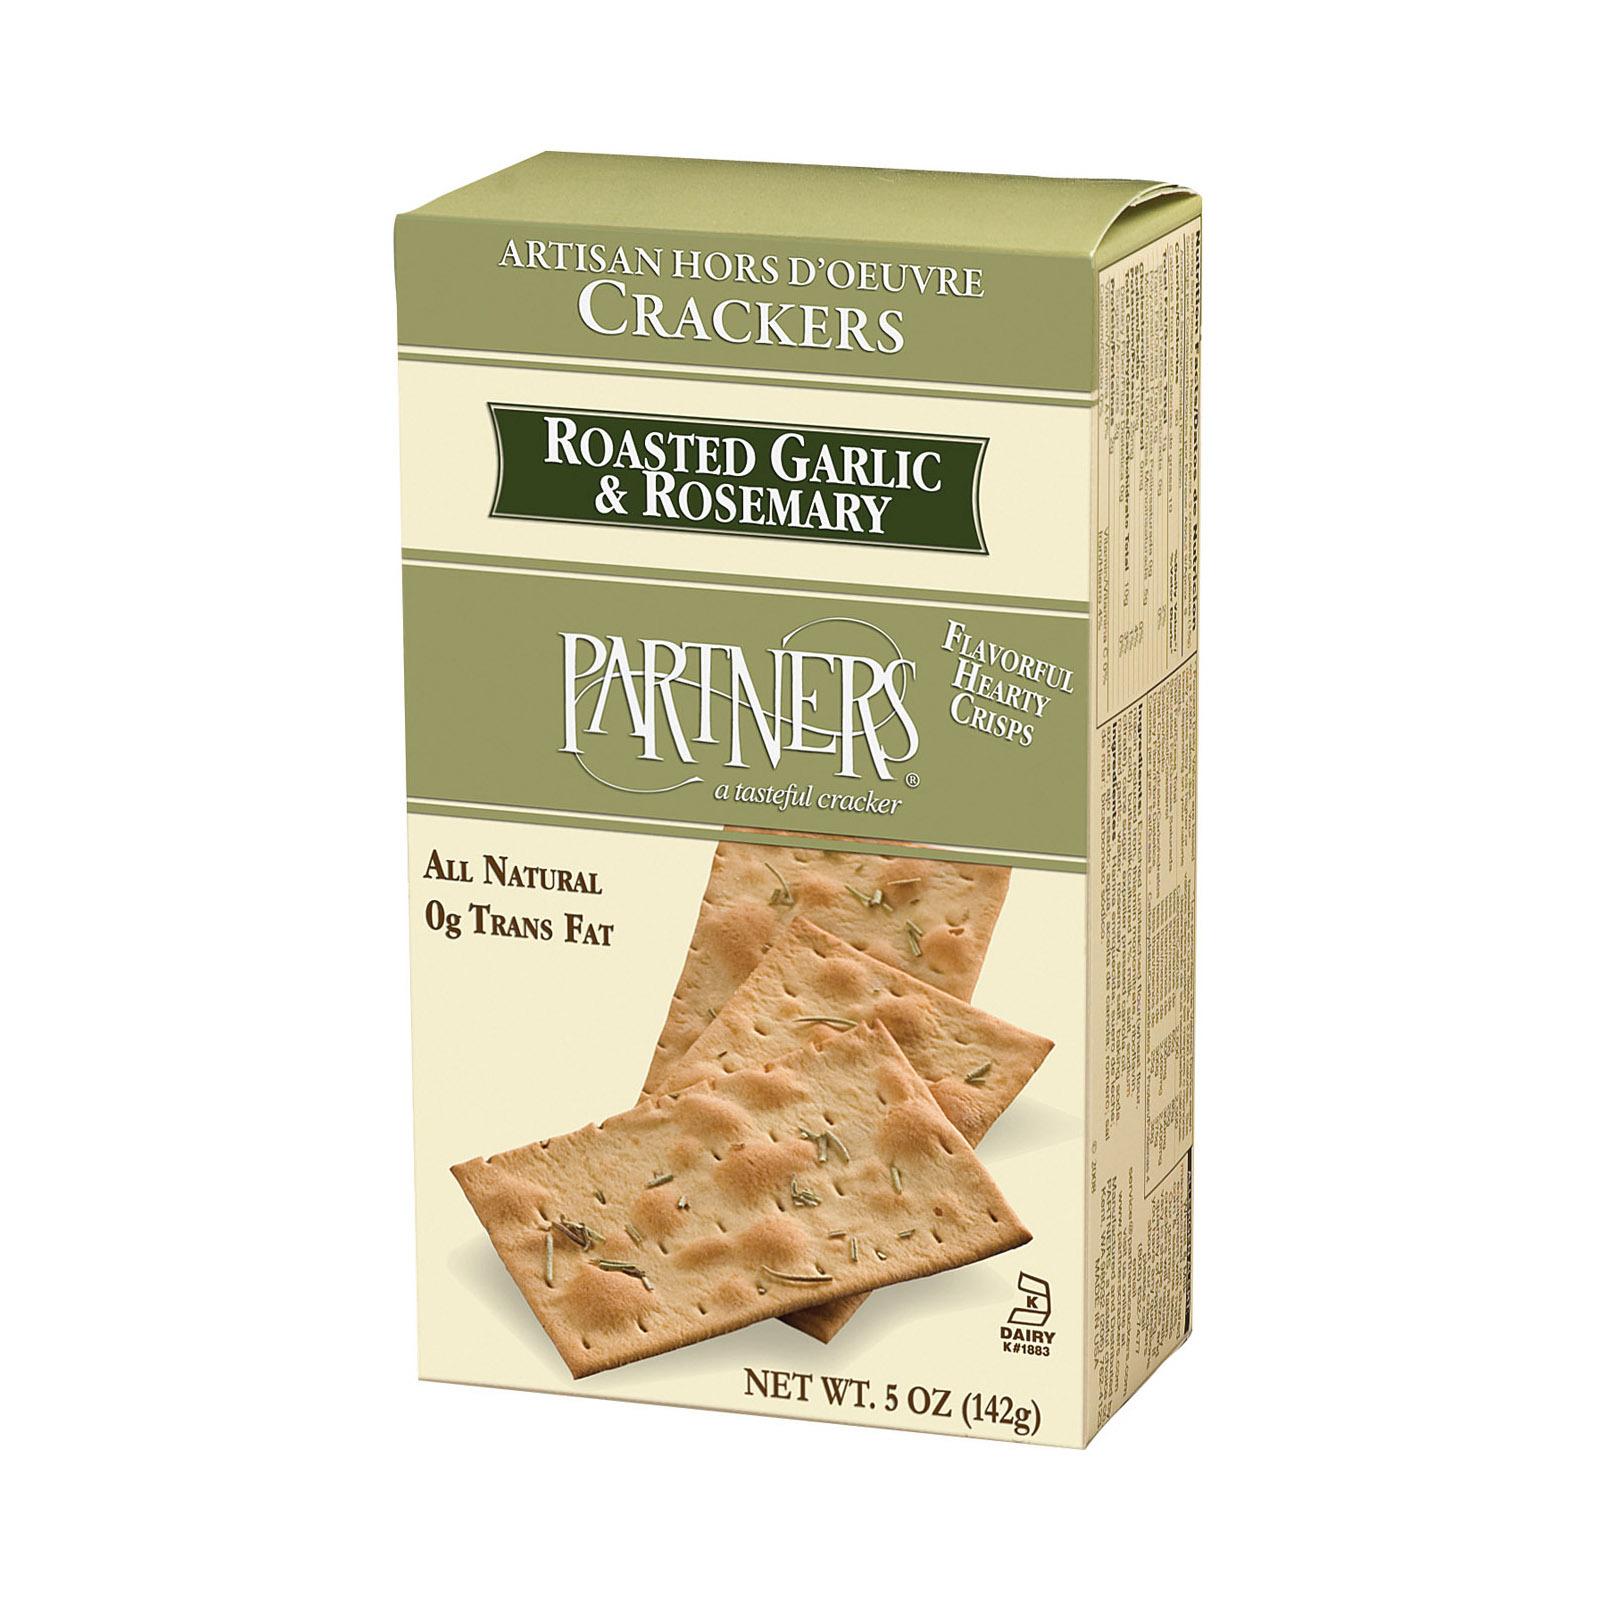 Partners Wise Crackers - Roasted Garlic Rosemary - Case of 6 - 5 oz.